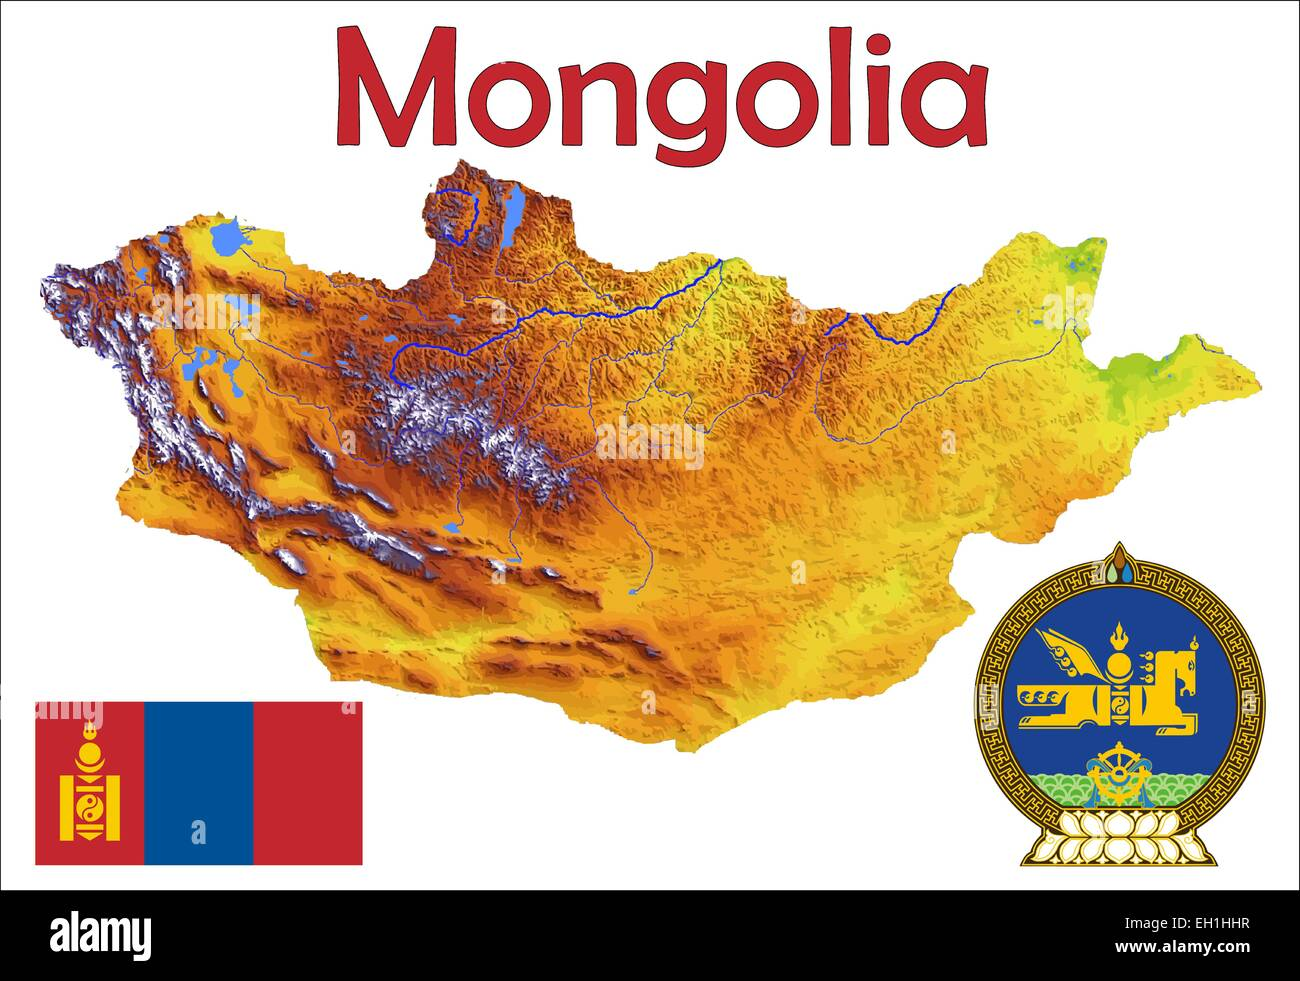 Mongolia map flag coat - Stock Image